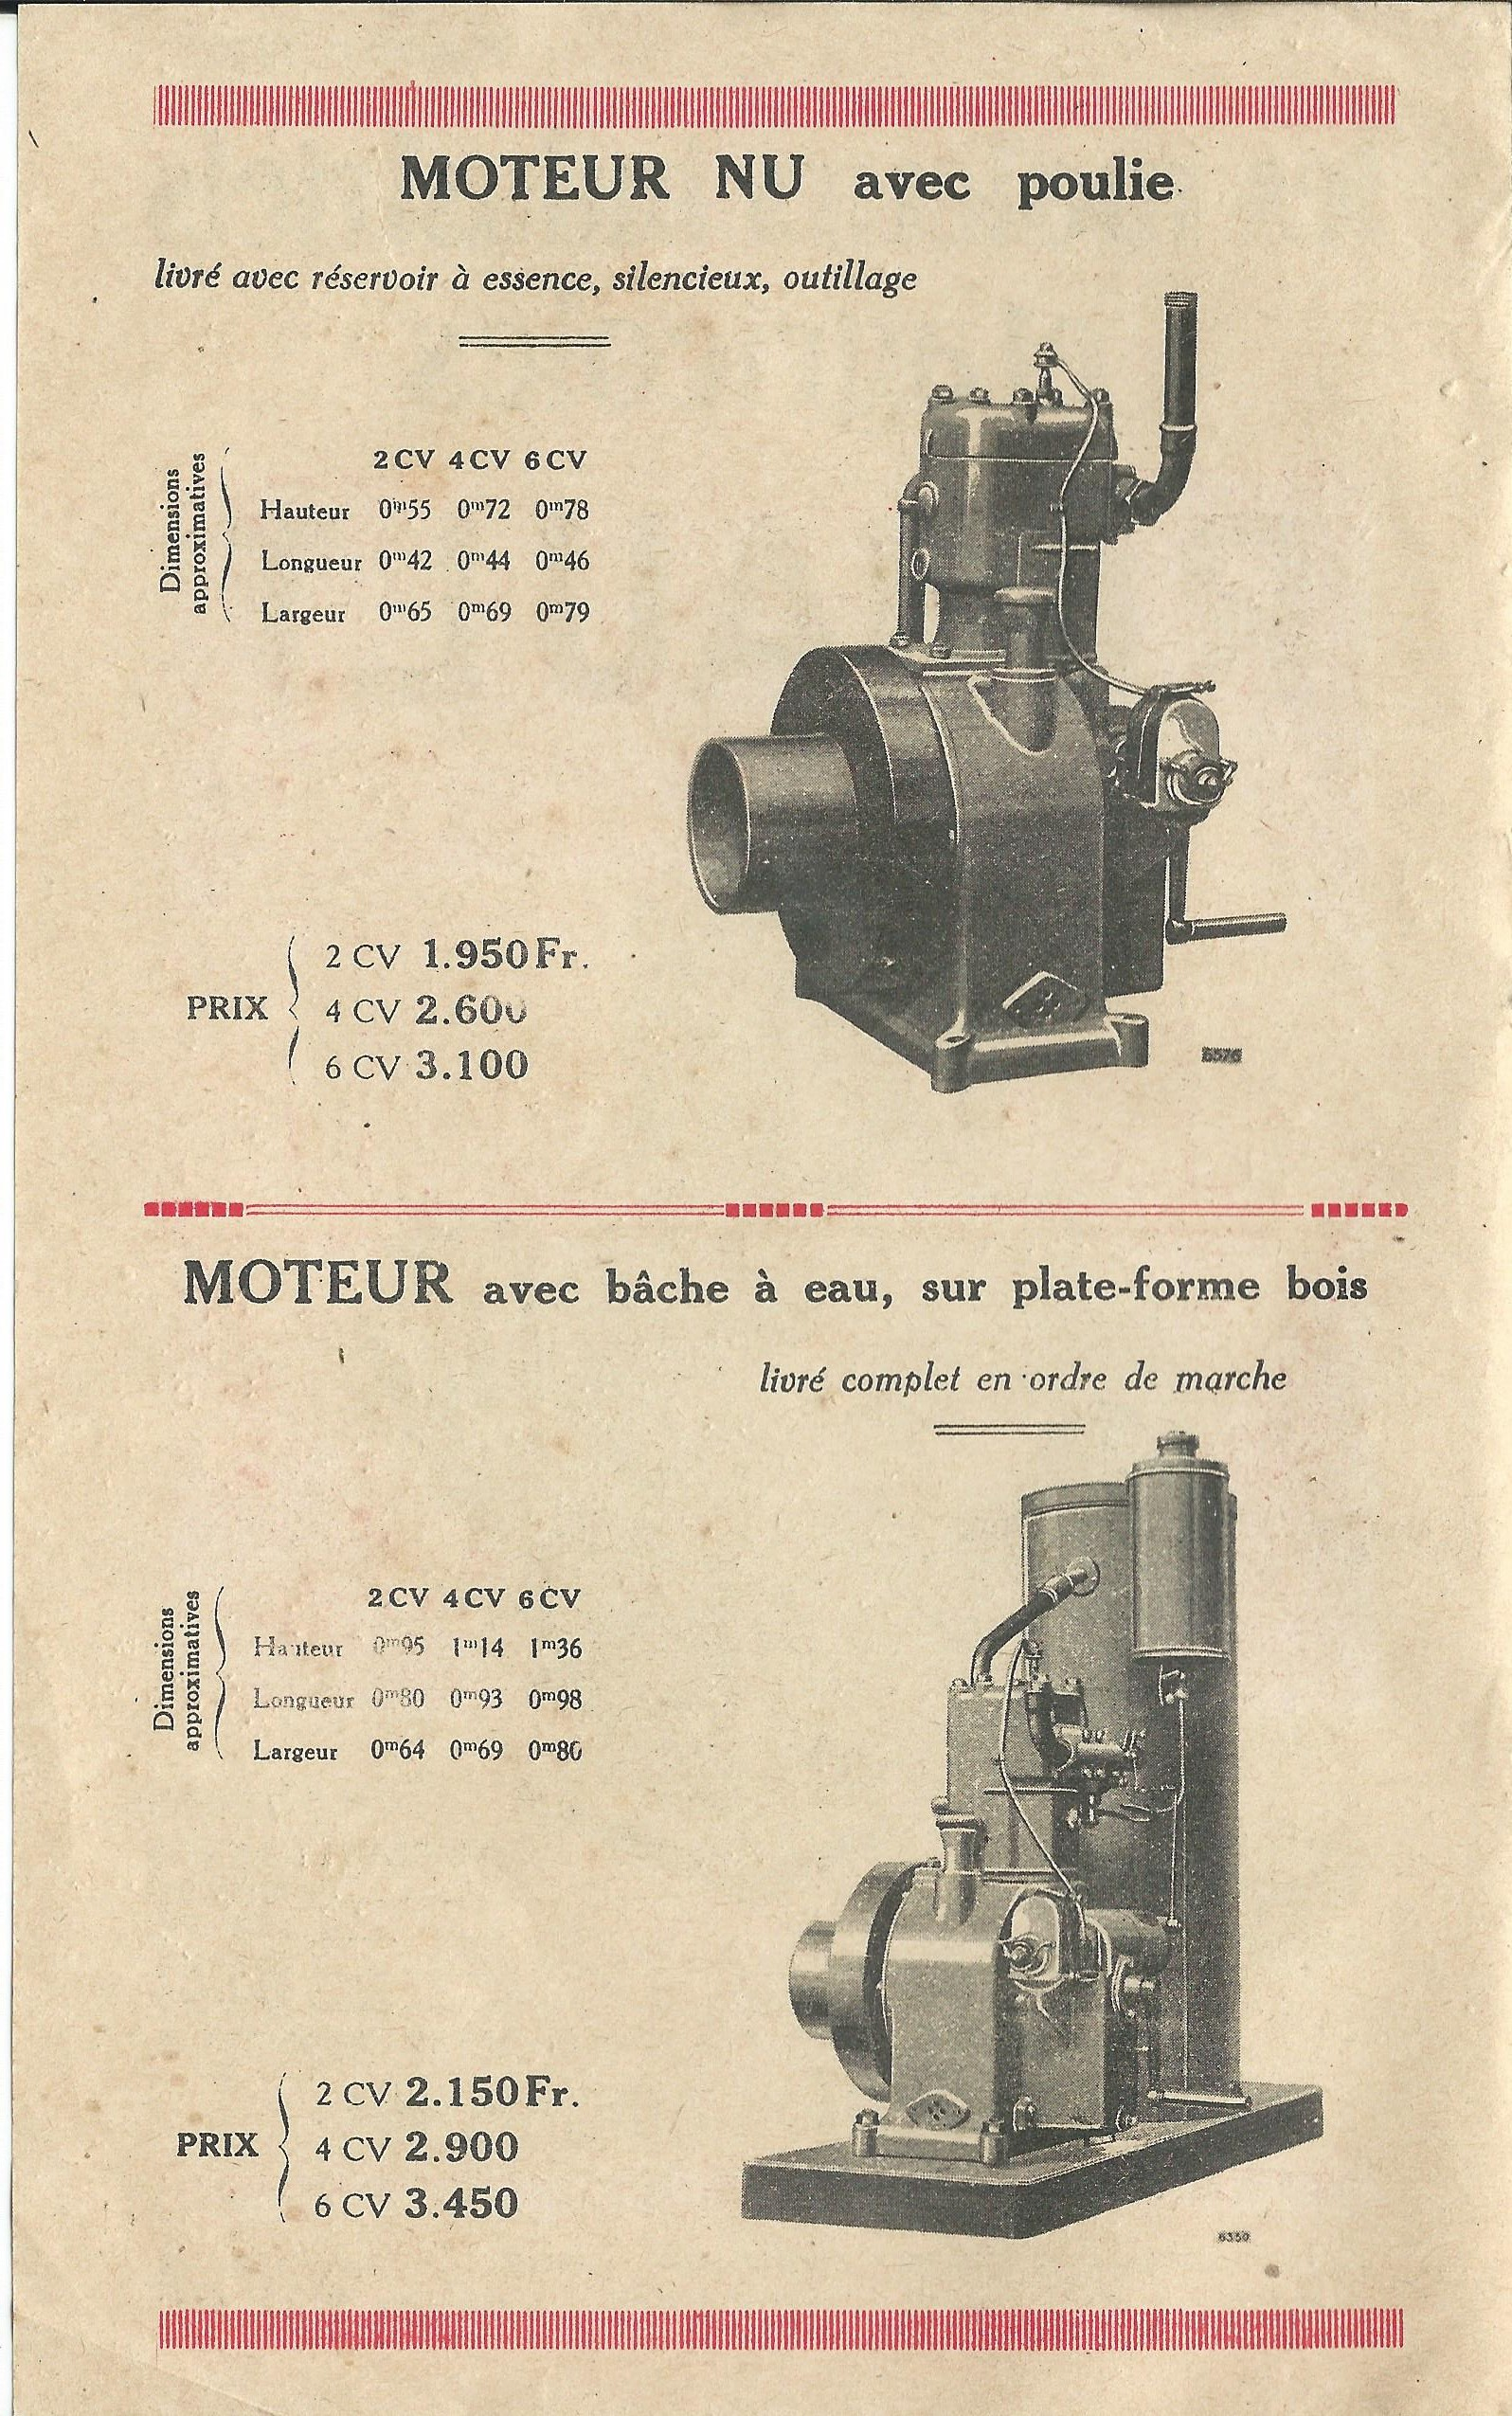 RENAULT - moteur renault 263 448164RENAULTmoteursfixes1927002